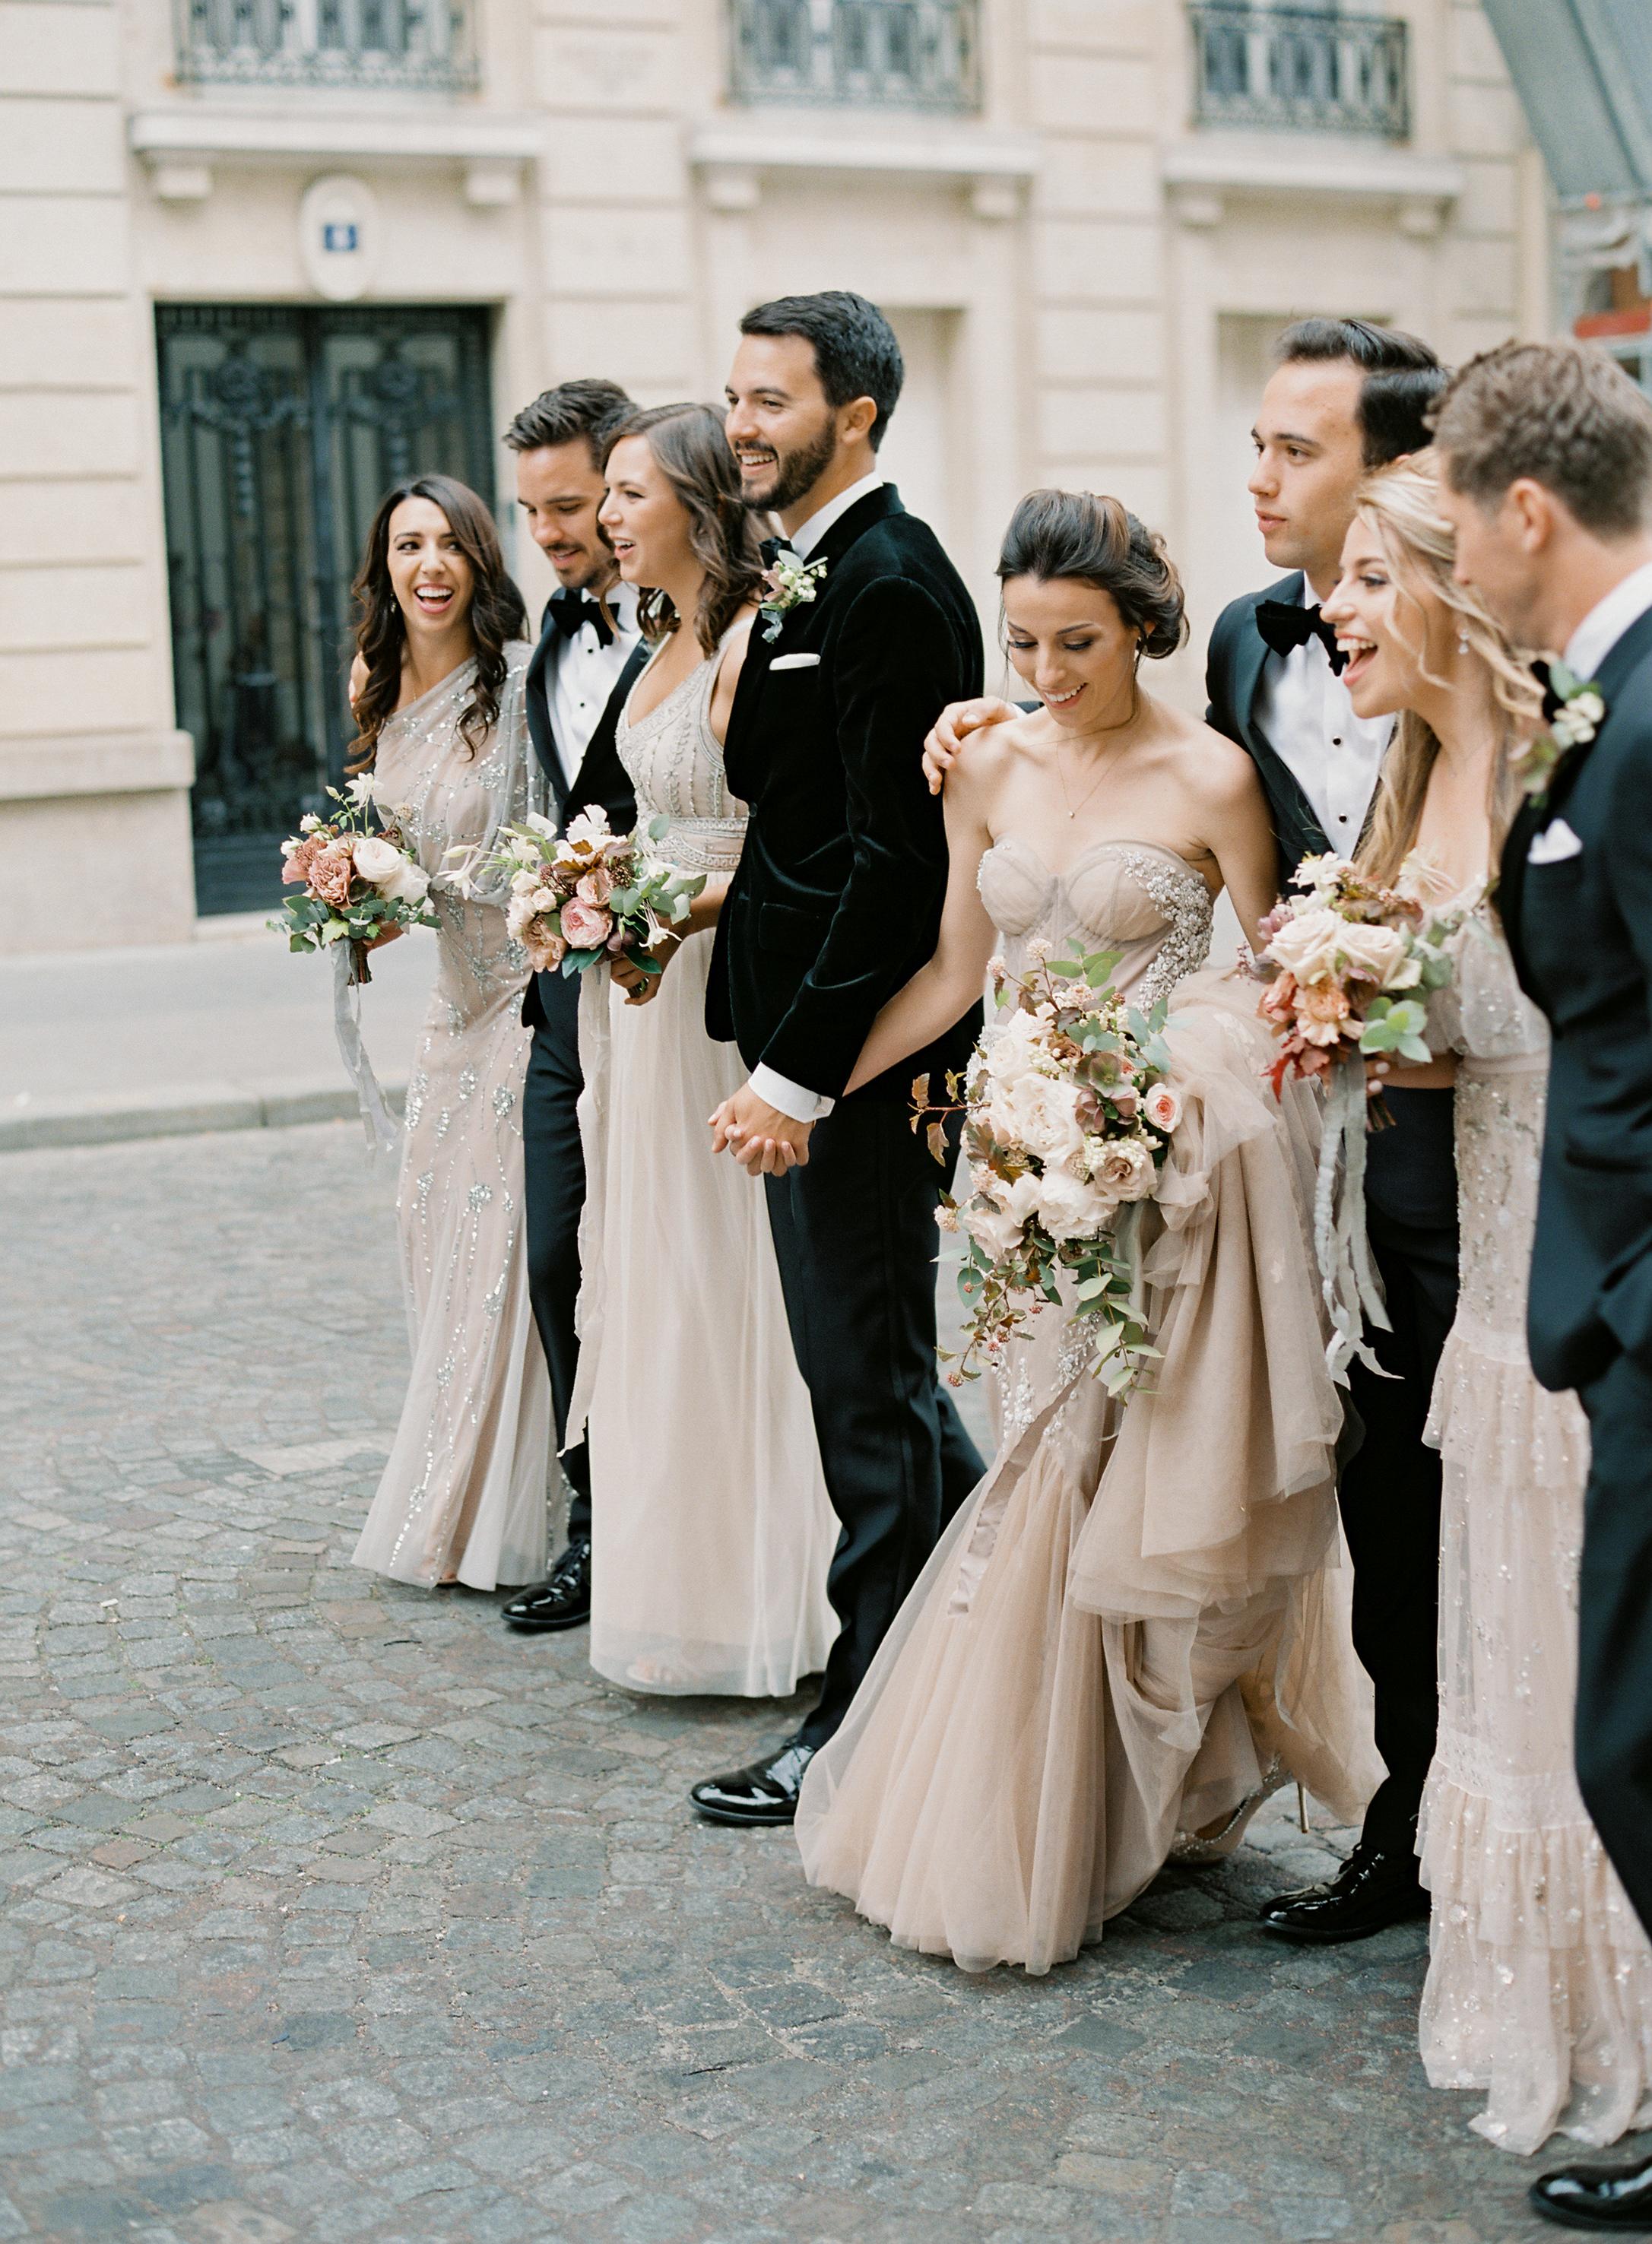 Ellen and Jeremy Wedding-Paris France-Carrie King Photographer-164.jpg